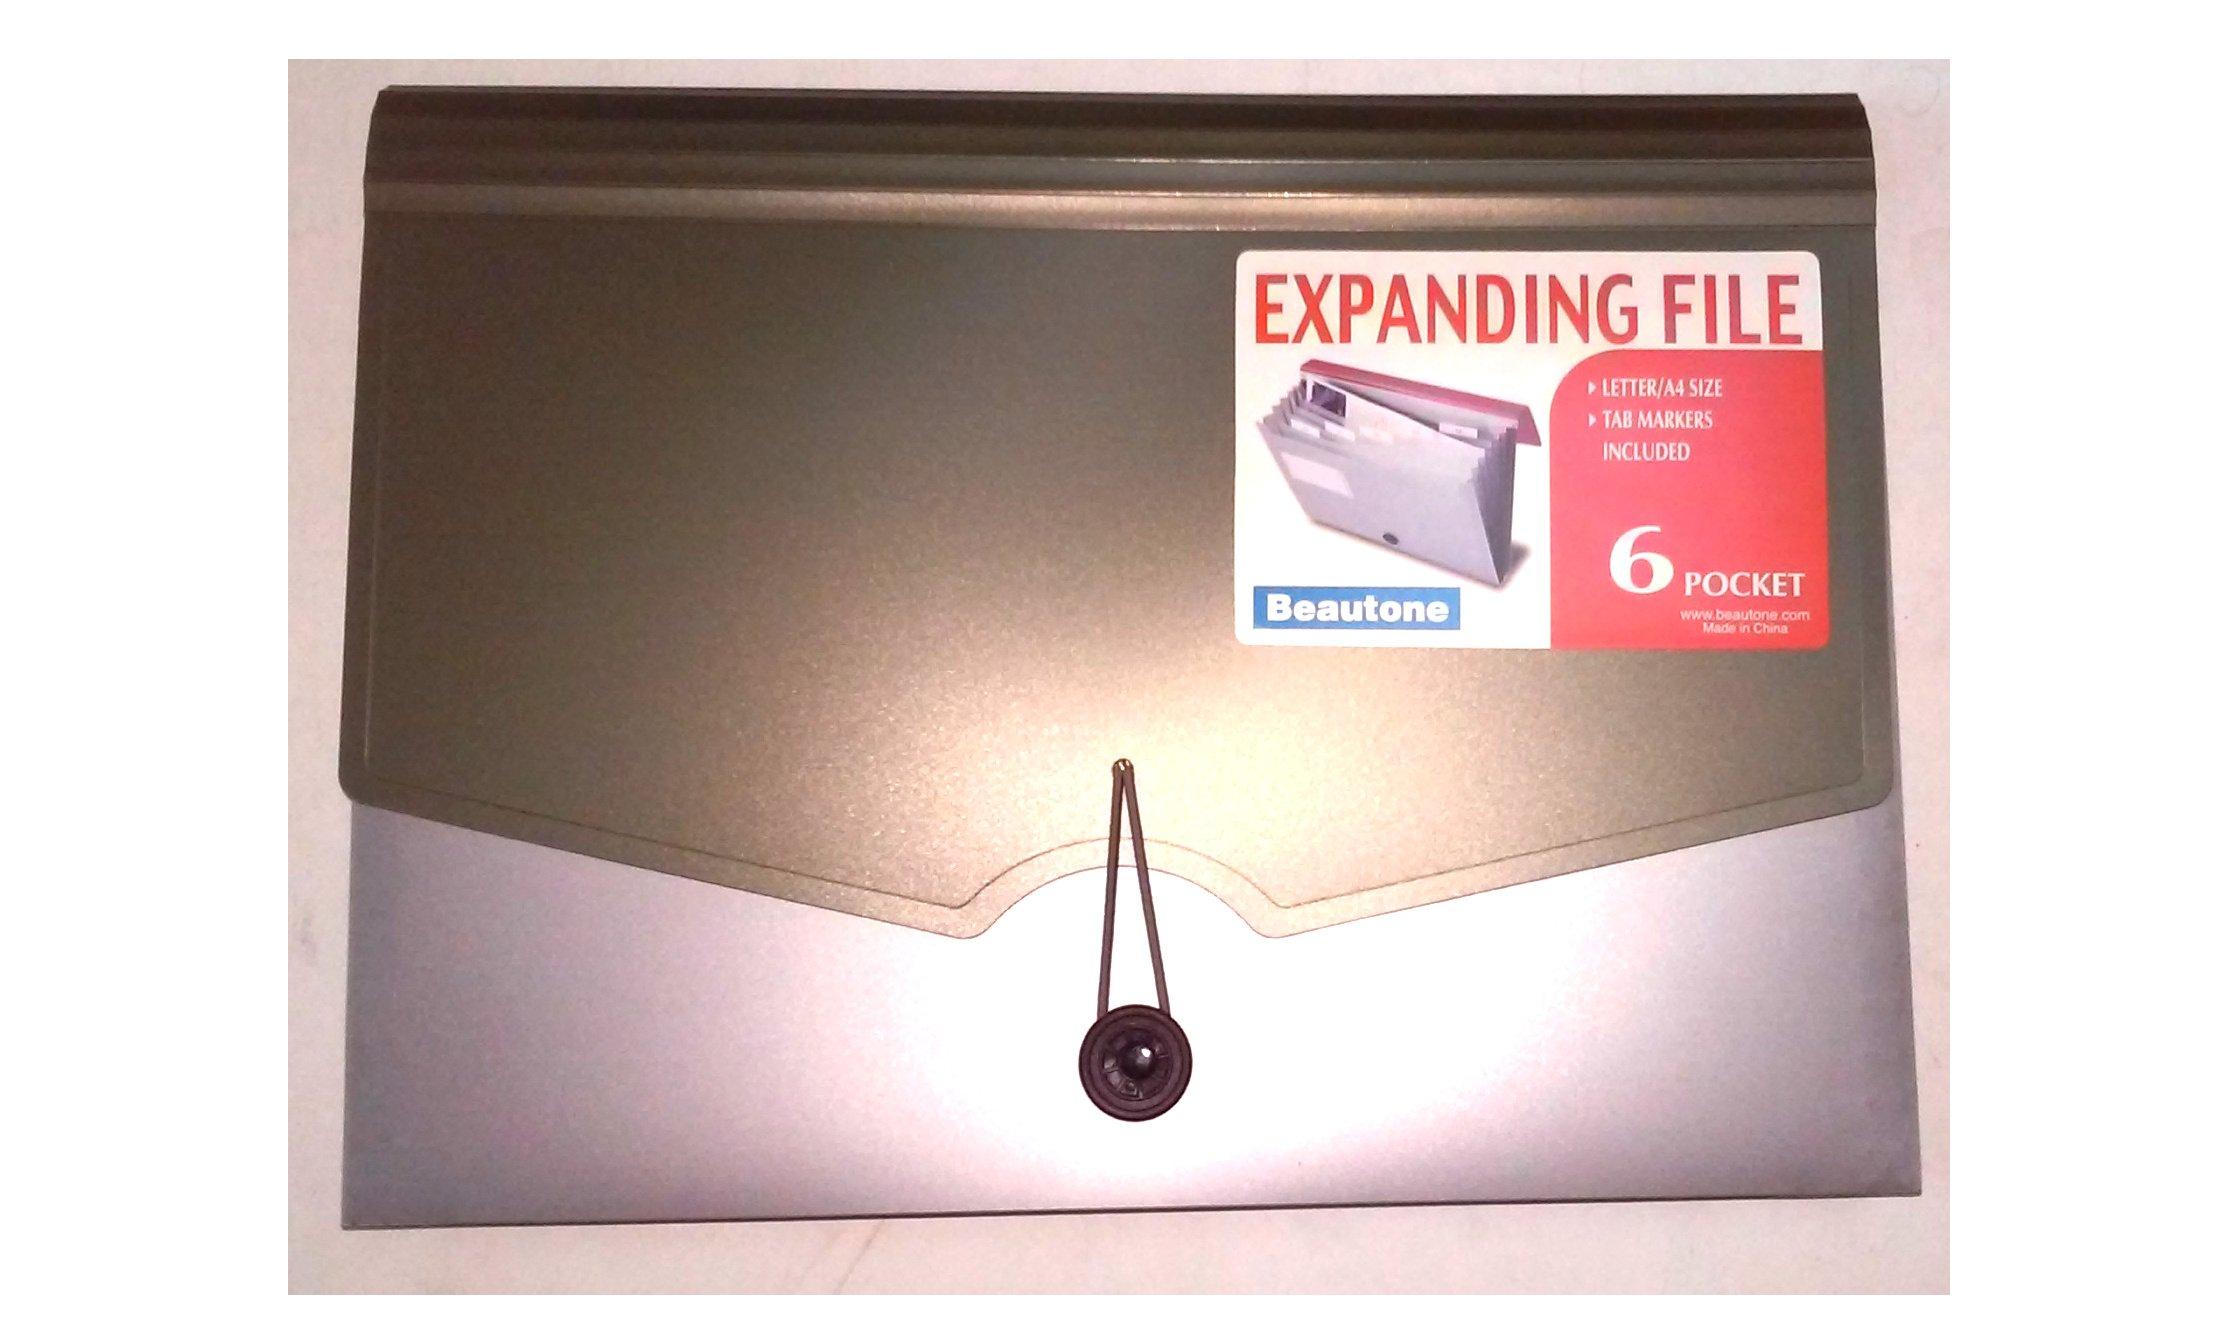 Beautone 42038 Expanding File 6 Pocket Letter/A4 Size